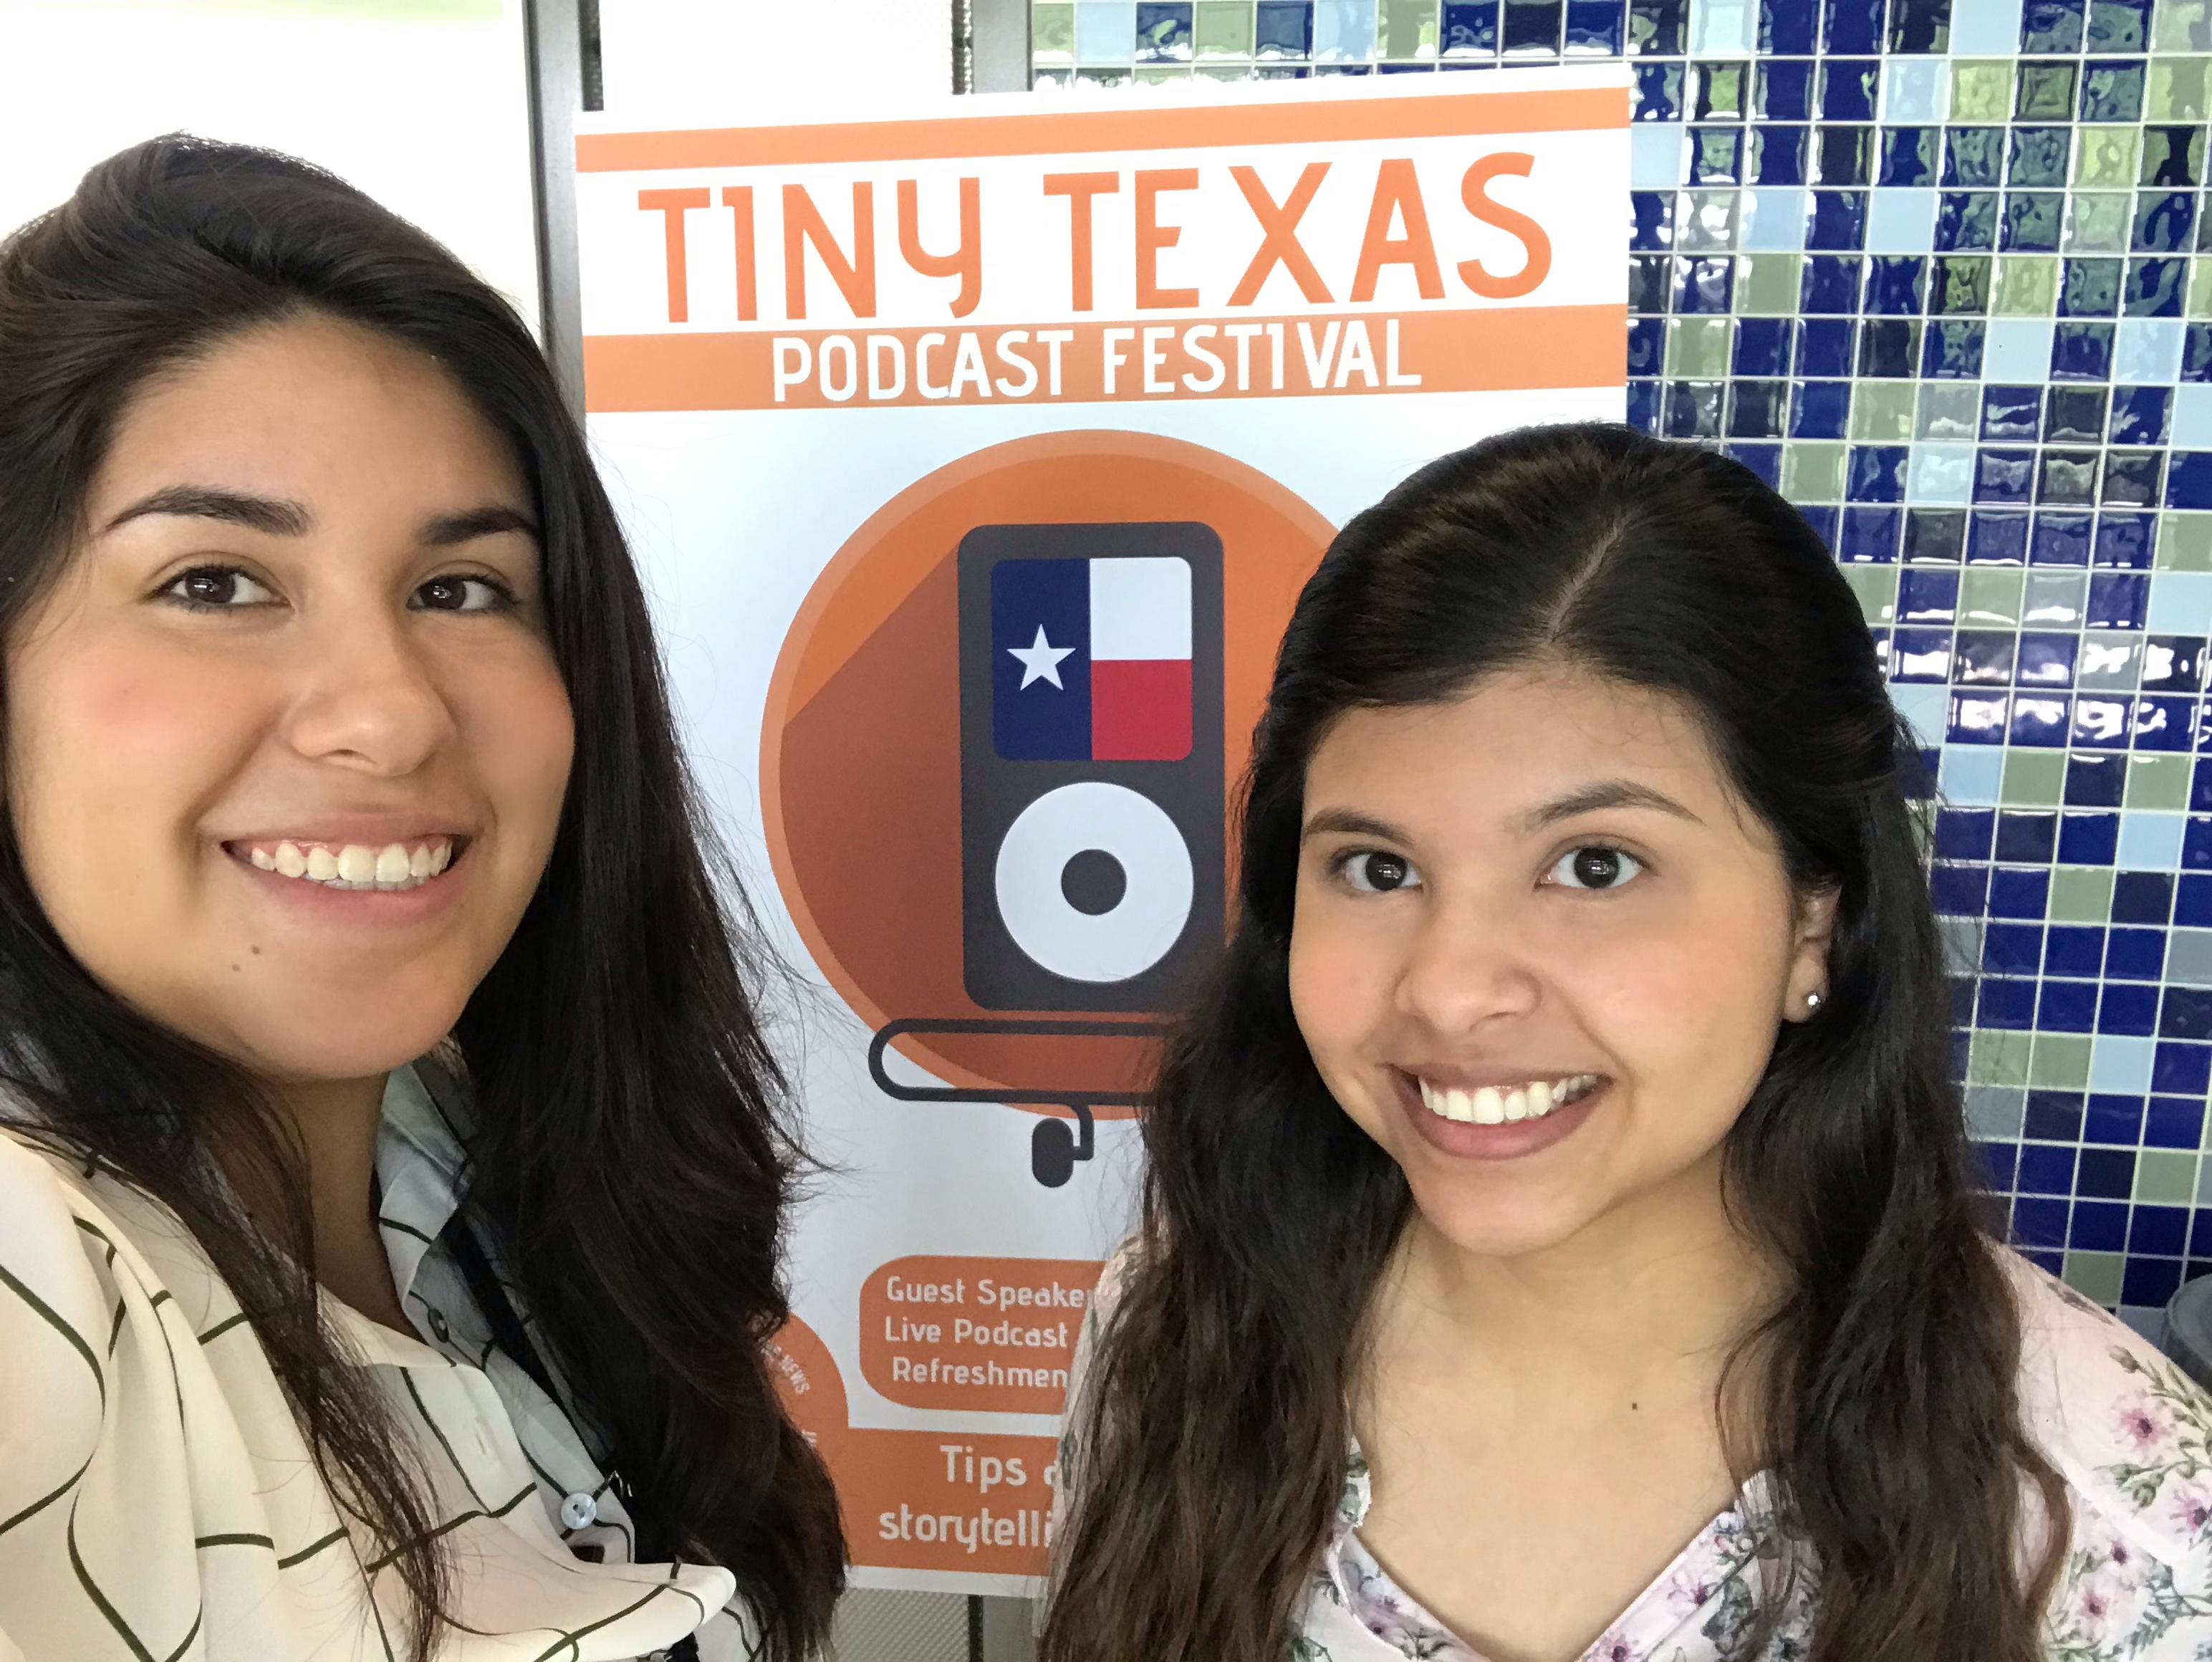 Jasmine and Daniela at the Tiny Texas Podcast Festival